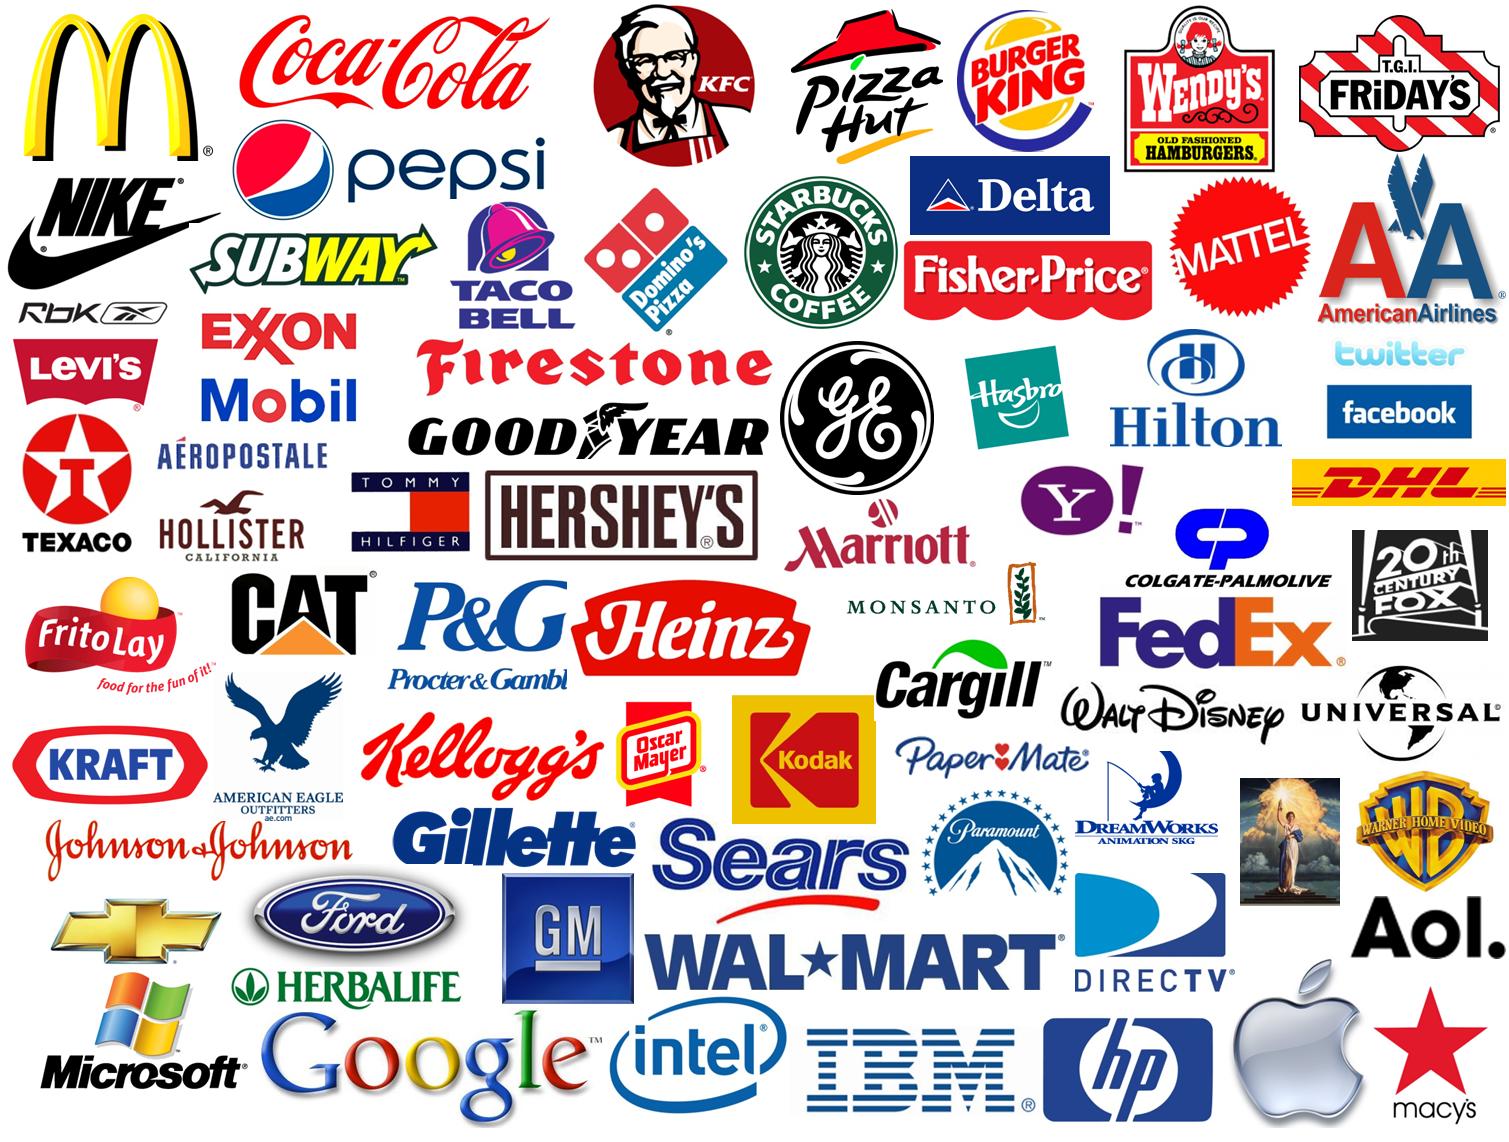 c mo acceder a una multinacional blog oficinaempleo